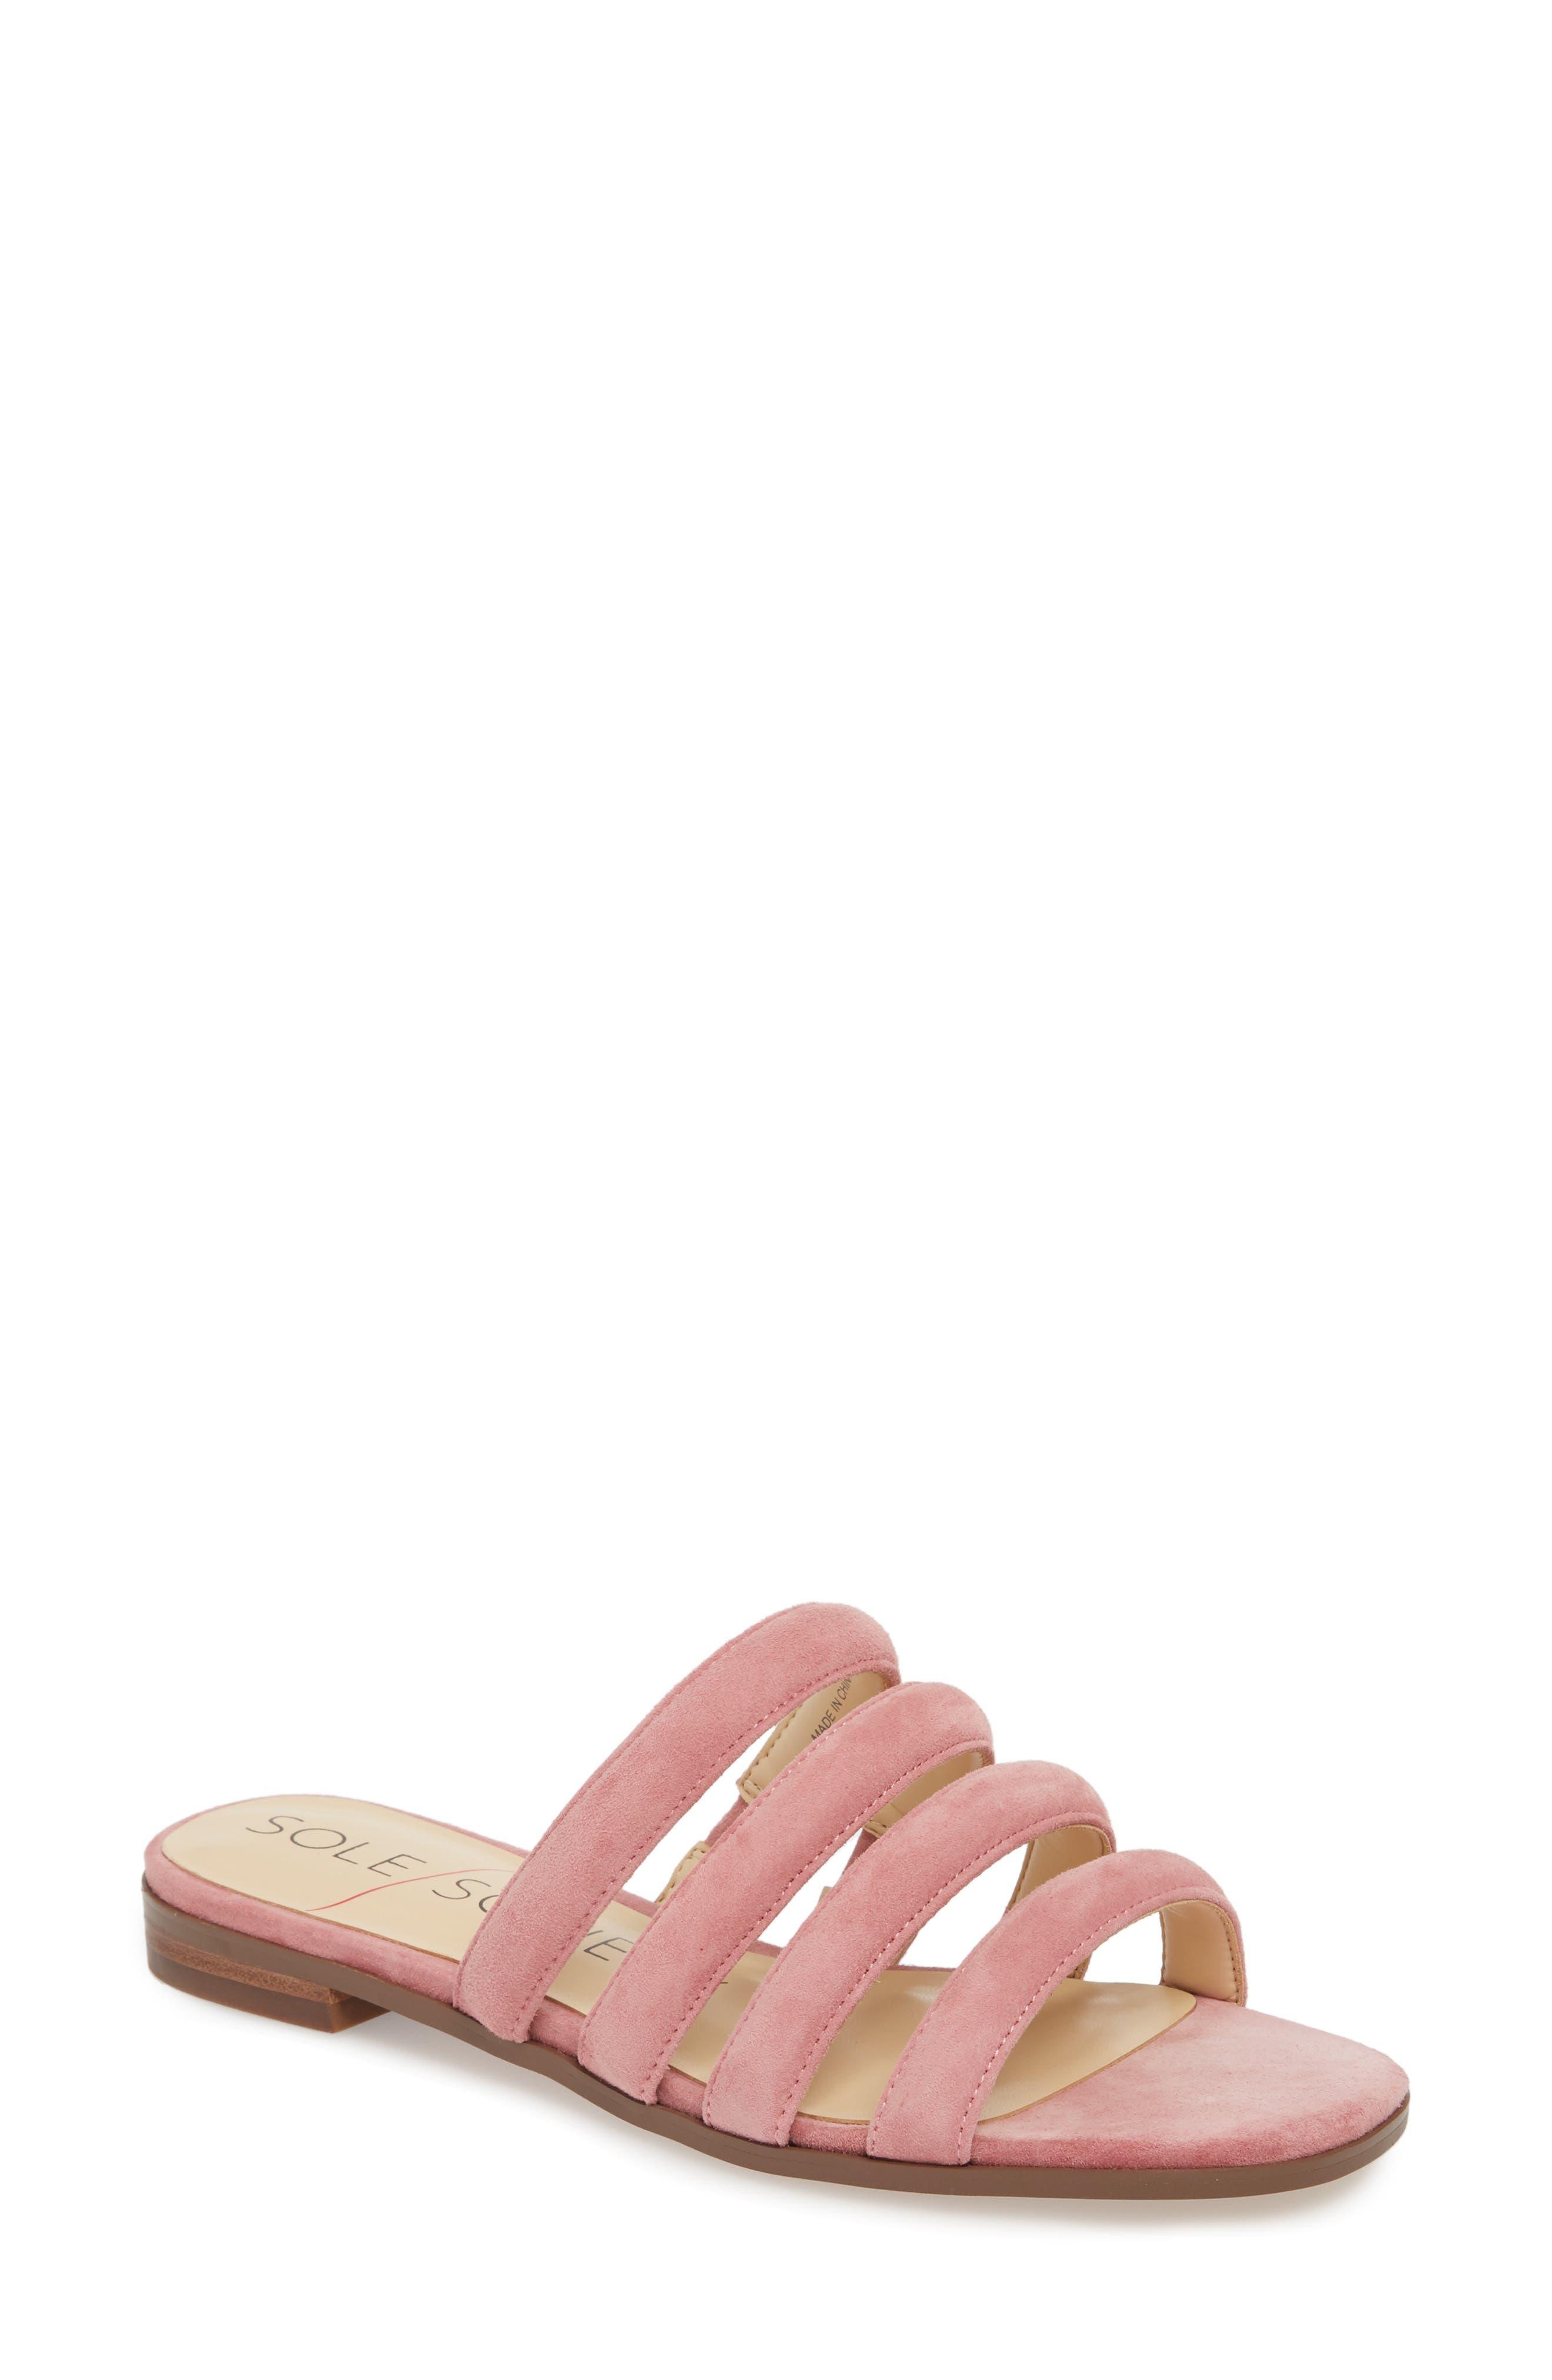 Saxten Strappy Slide Sandal,                             Main thumbnail 1, color,                             PRIMROSE